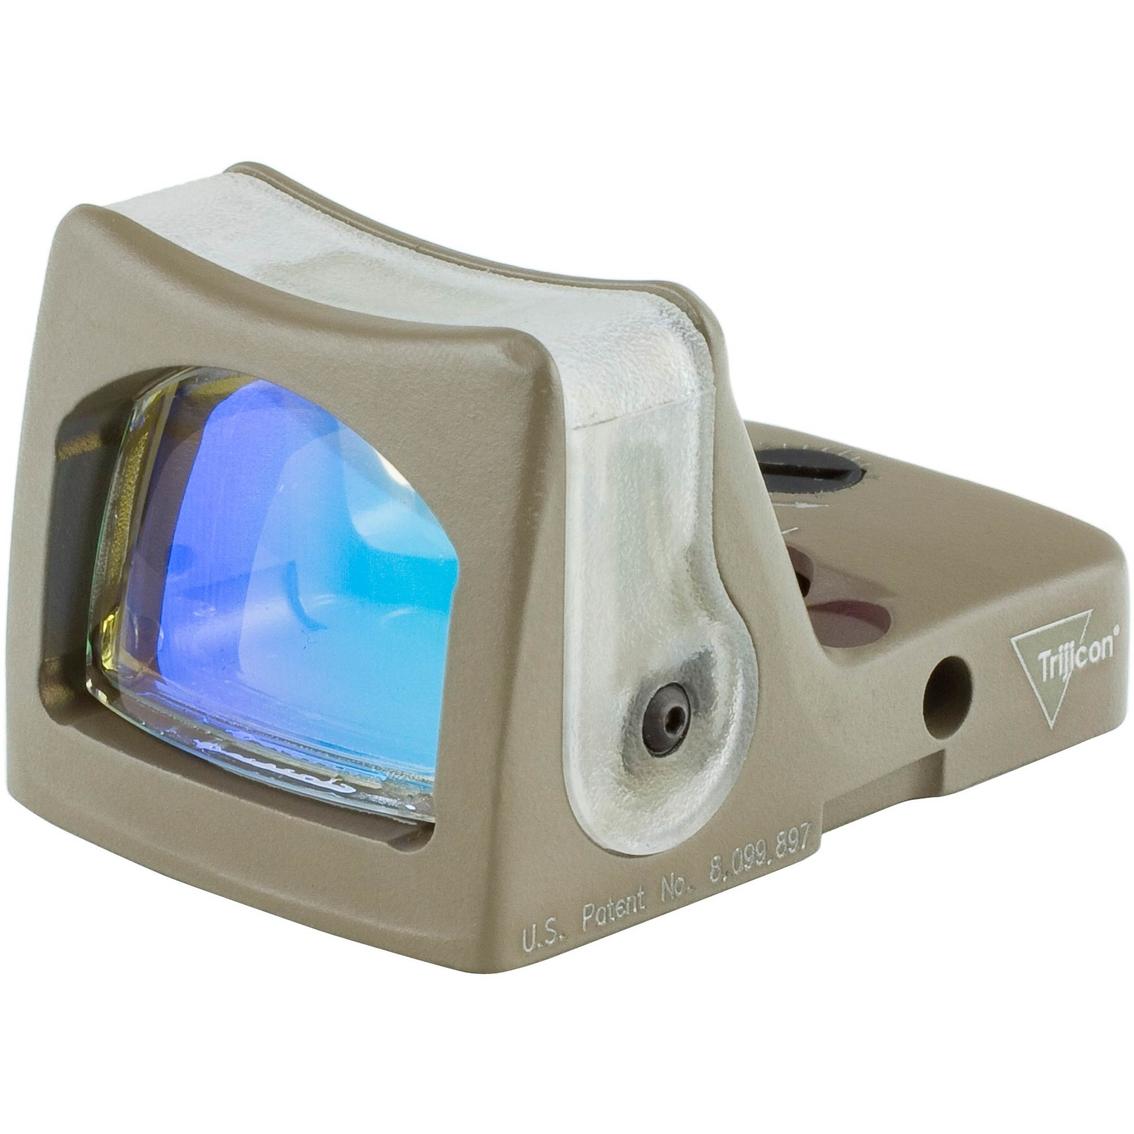 trijicon rmr dl ilum 9moa grn dt fde scopes binoculars military shop the exchange exchange